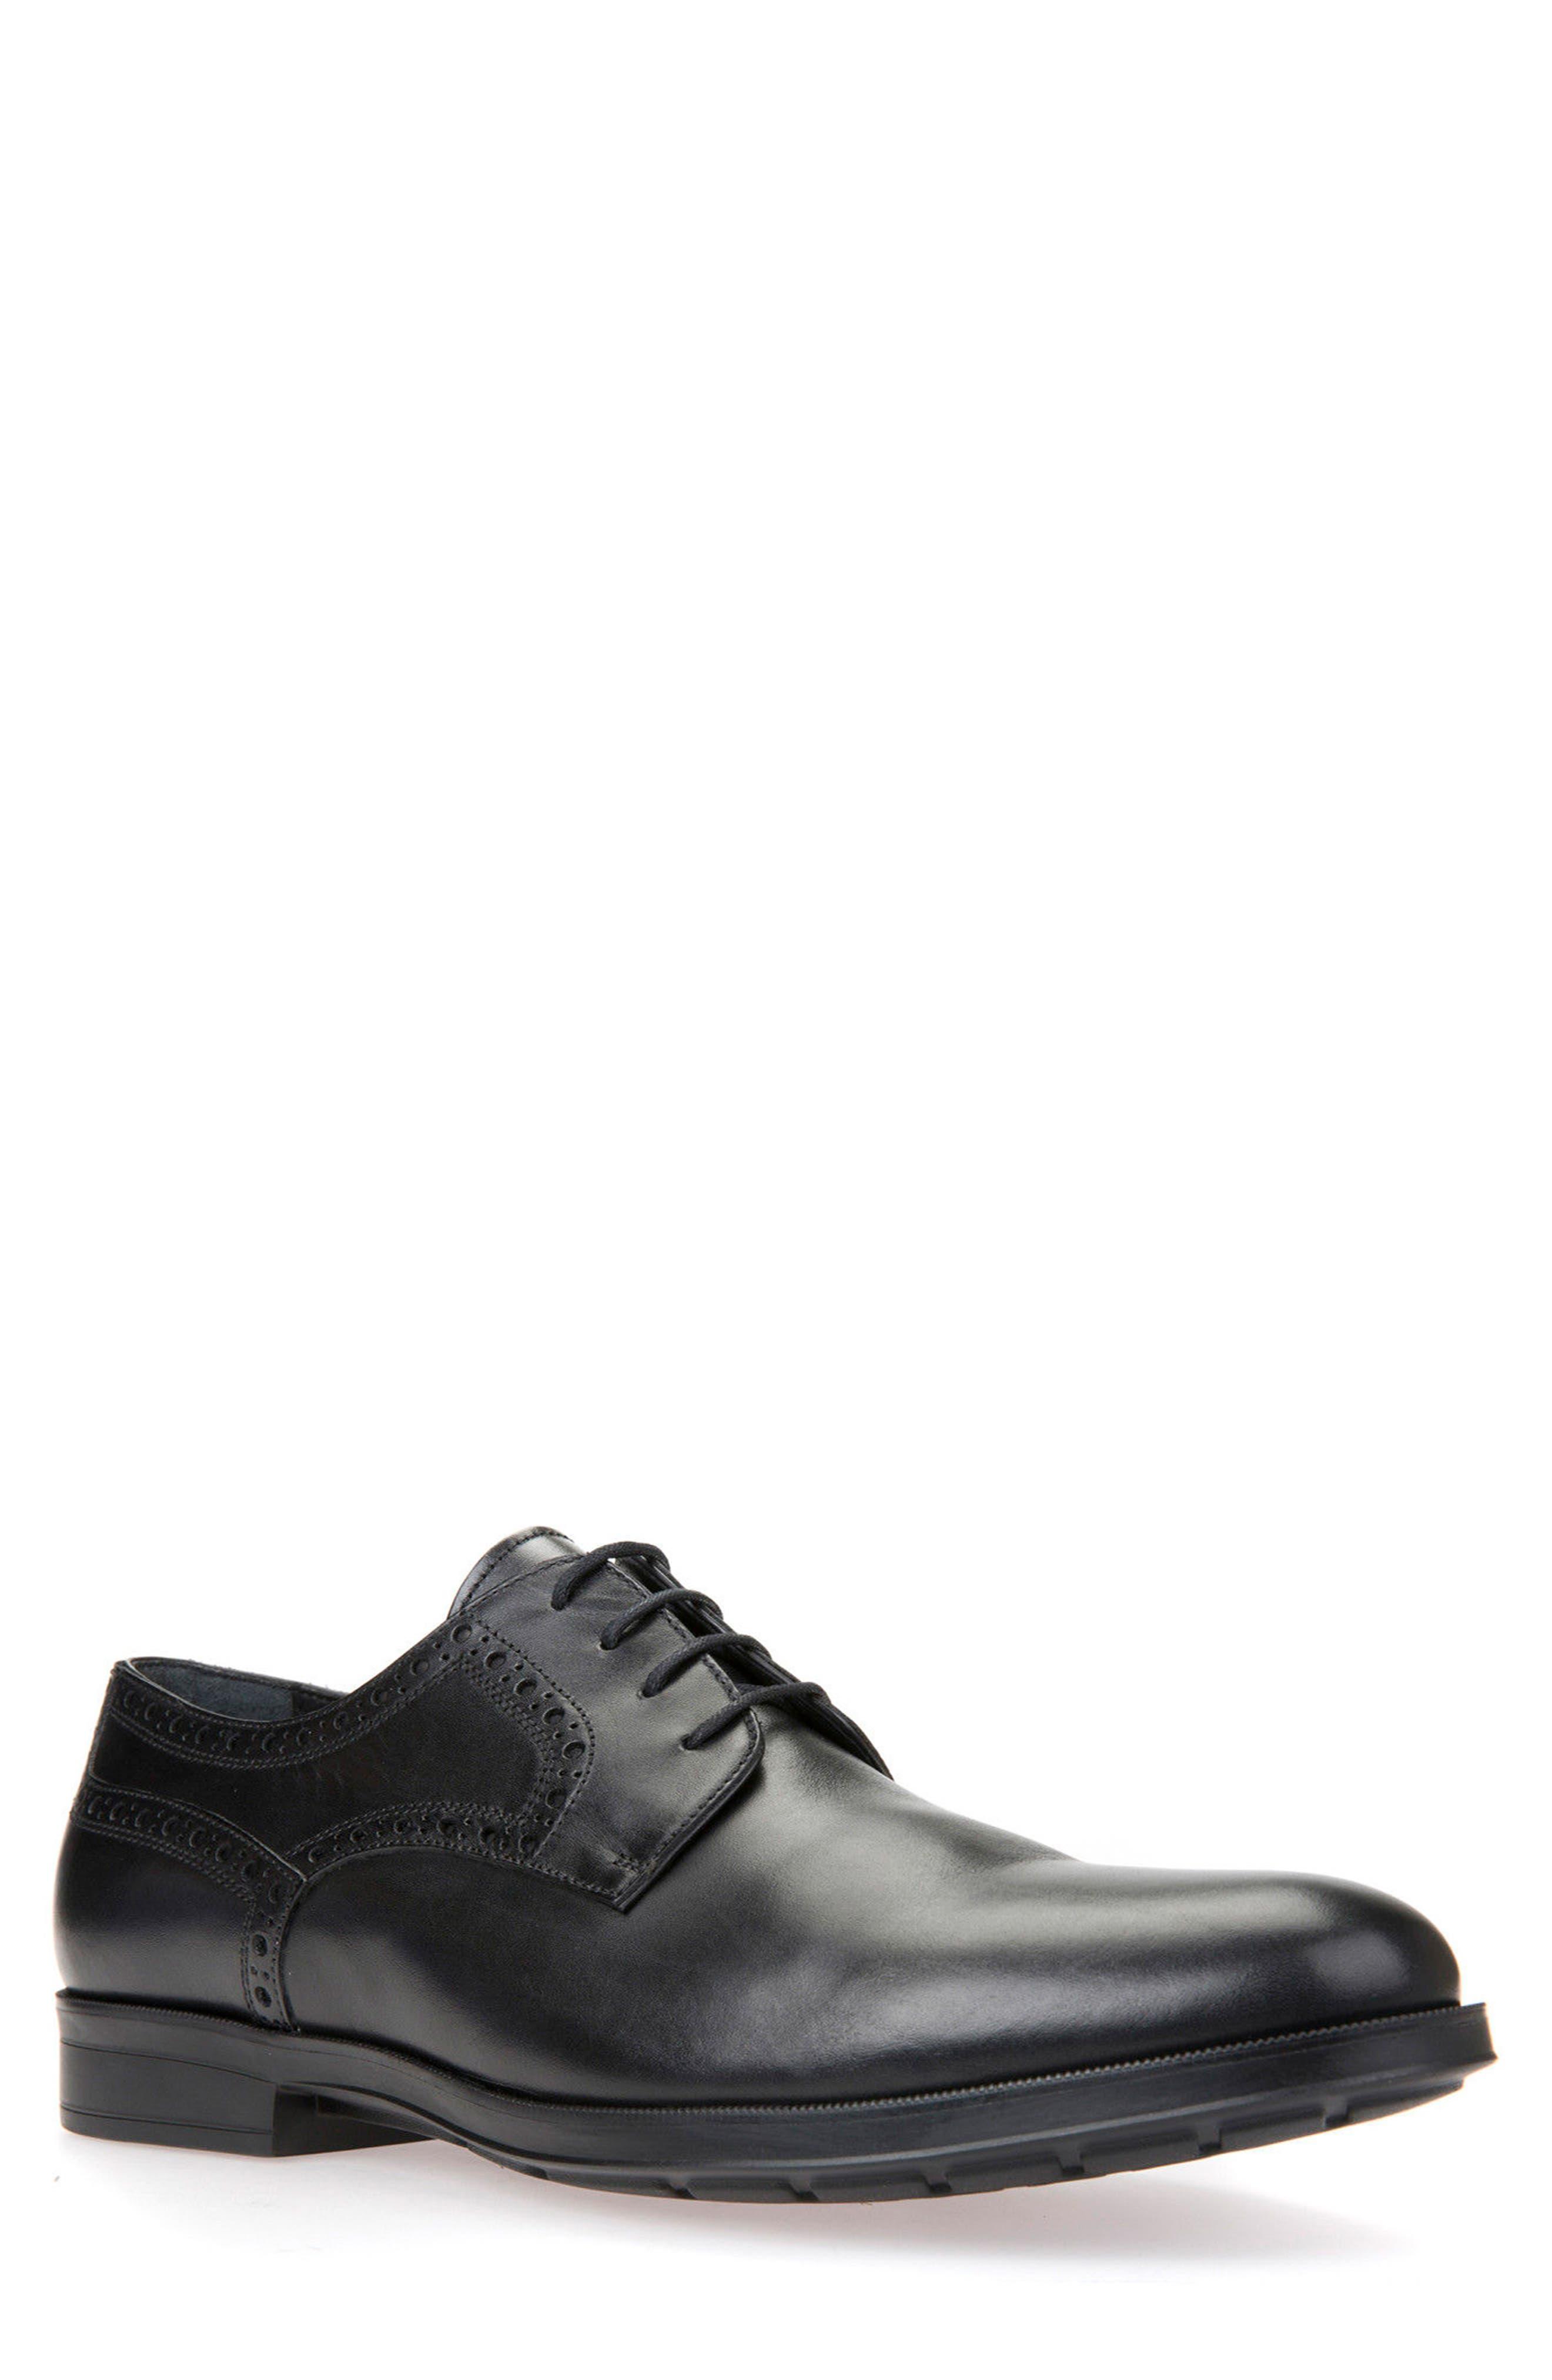 GEOX Hilstone 3 Plain Toe Derby, Main, color, BLACK LEATHER